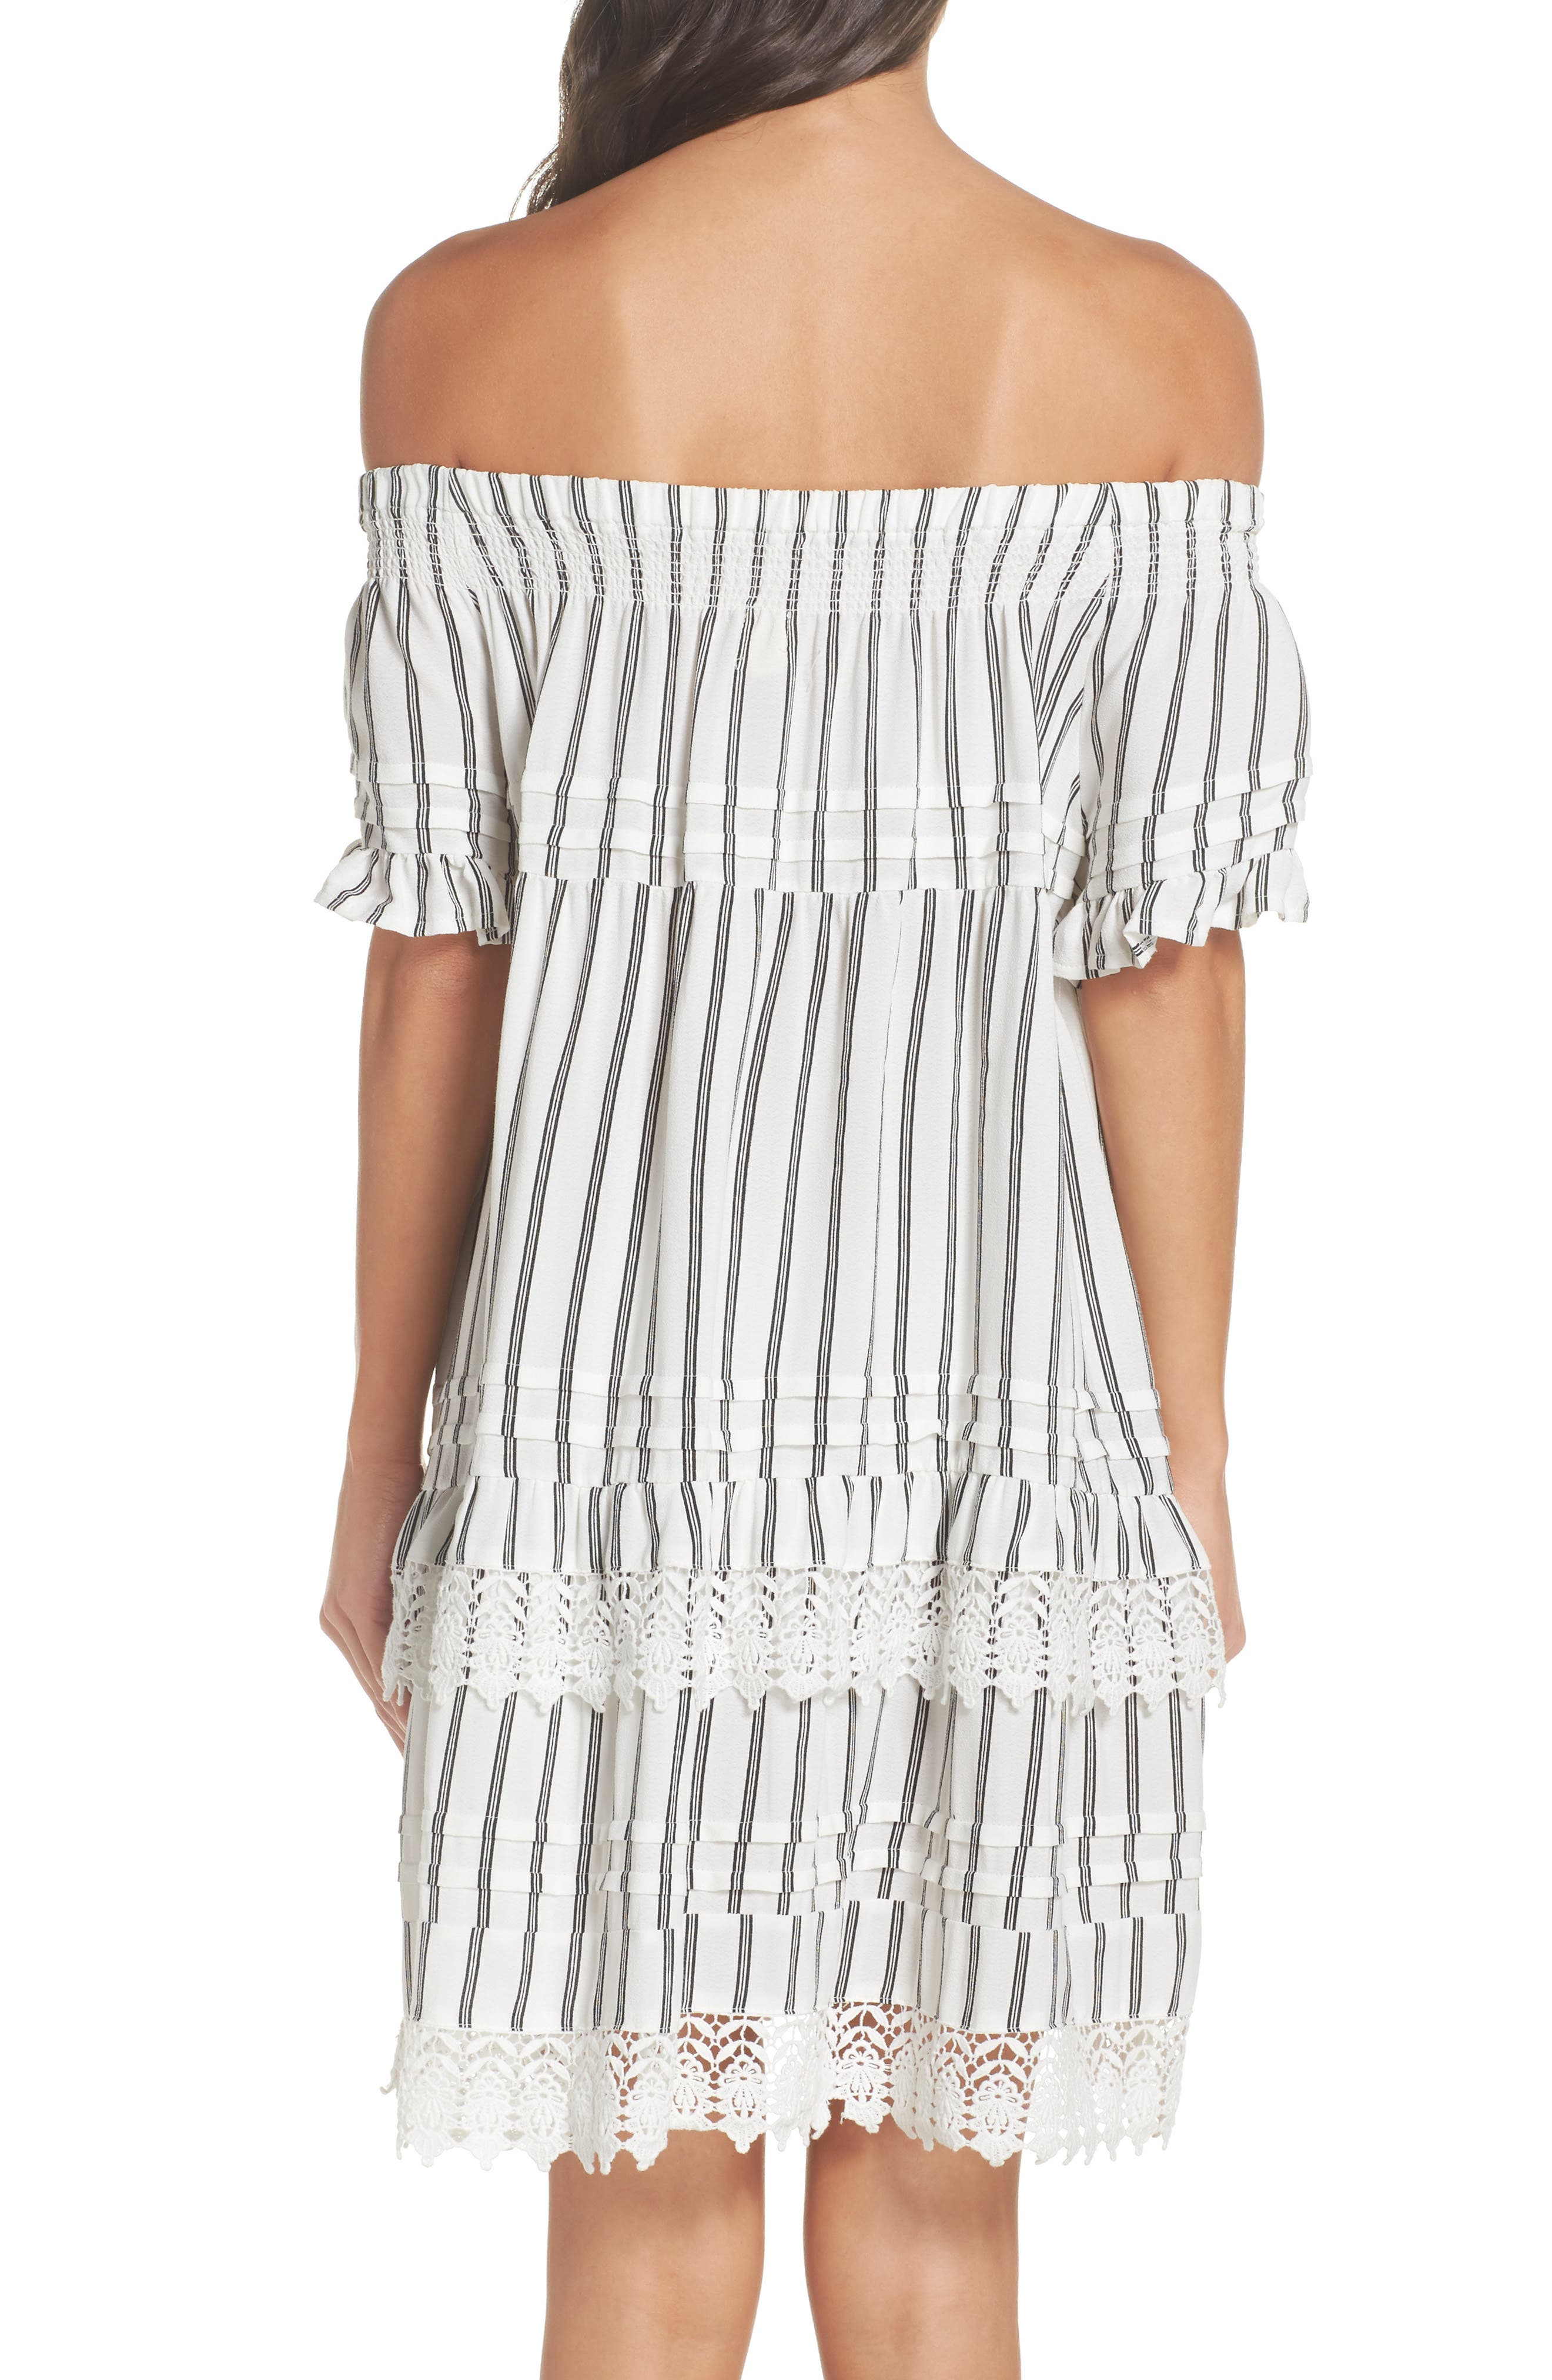 Off the Shoulder Cover-Up Dress,                             Alternate thumbnail 3, color,                             Ivory/ Black